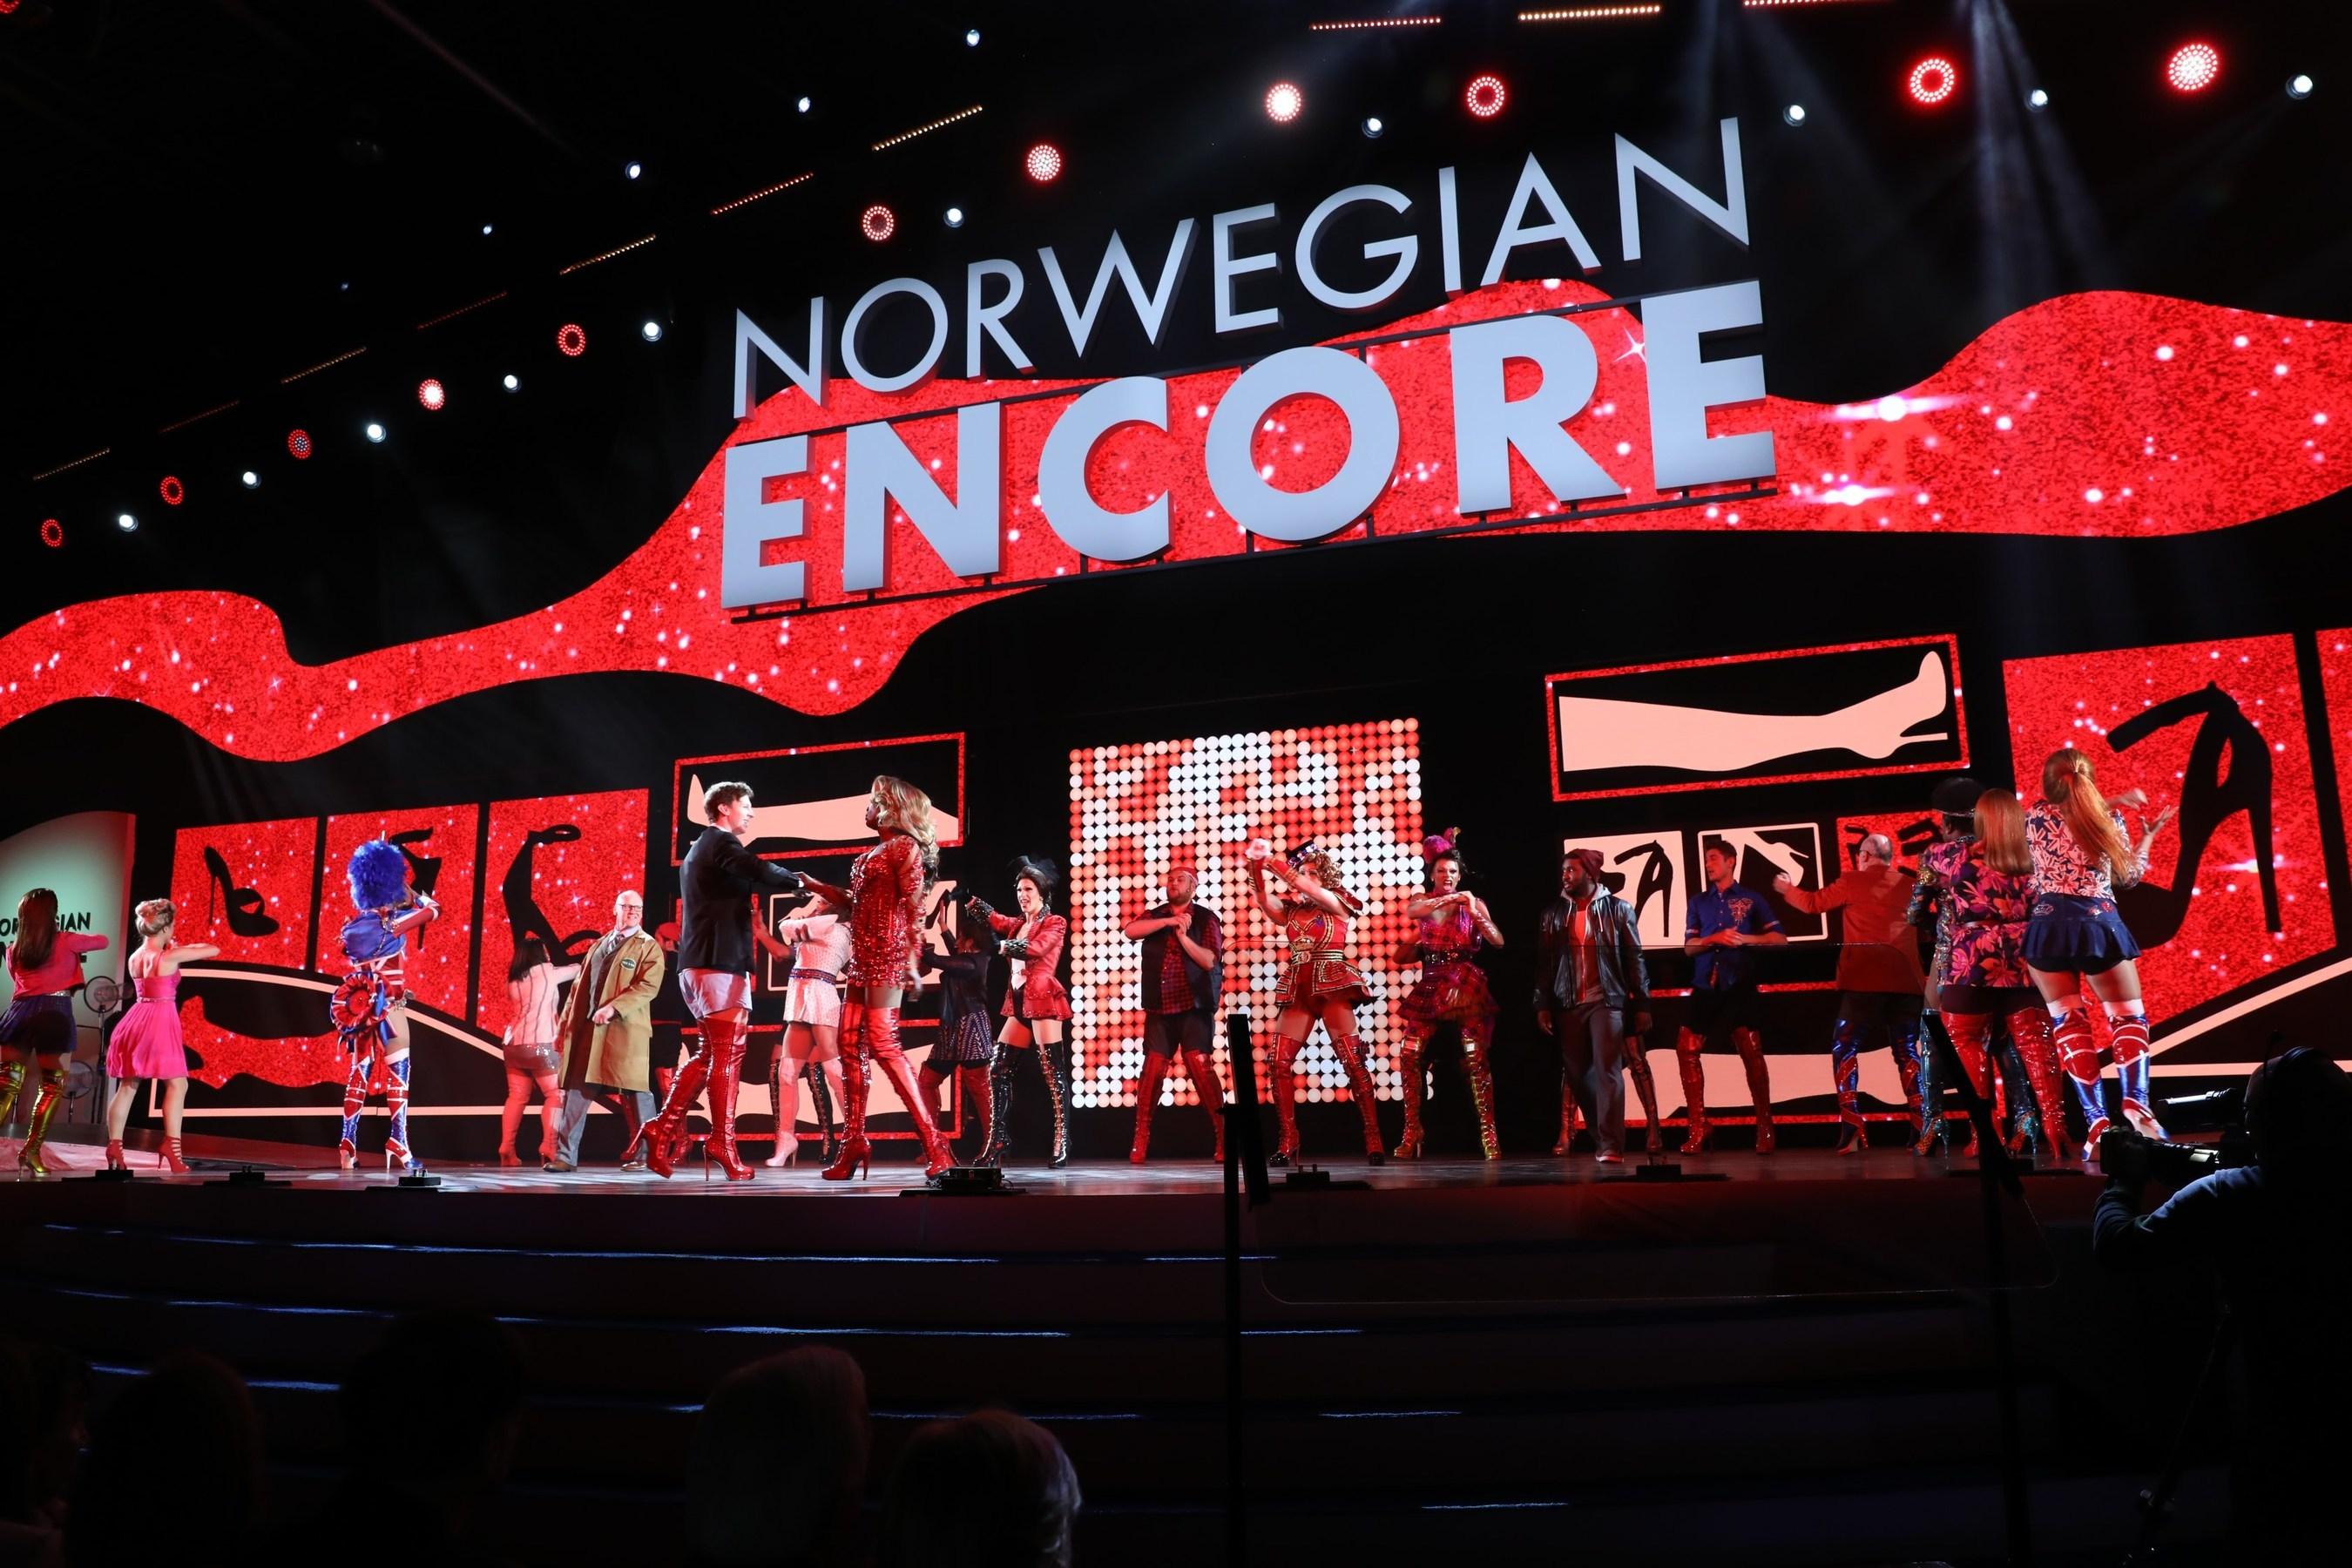 Norwegian Cruise Line Christens Newest Innovative Ship